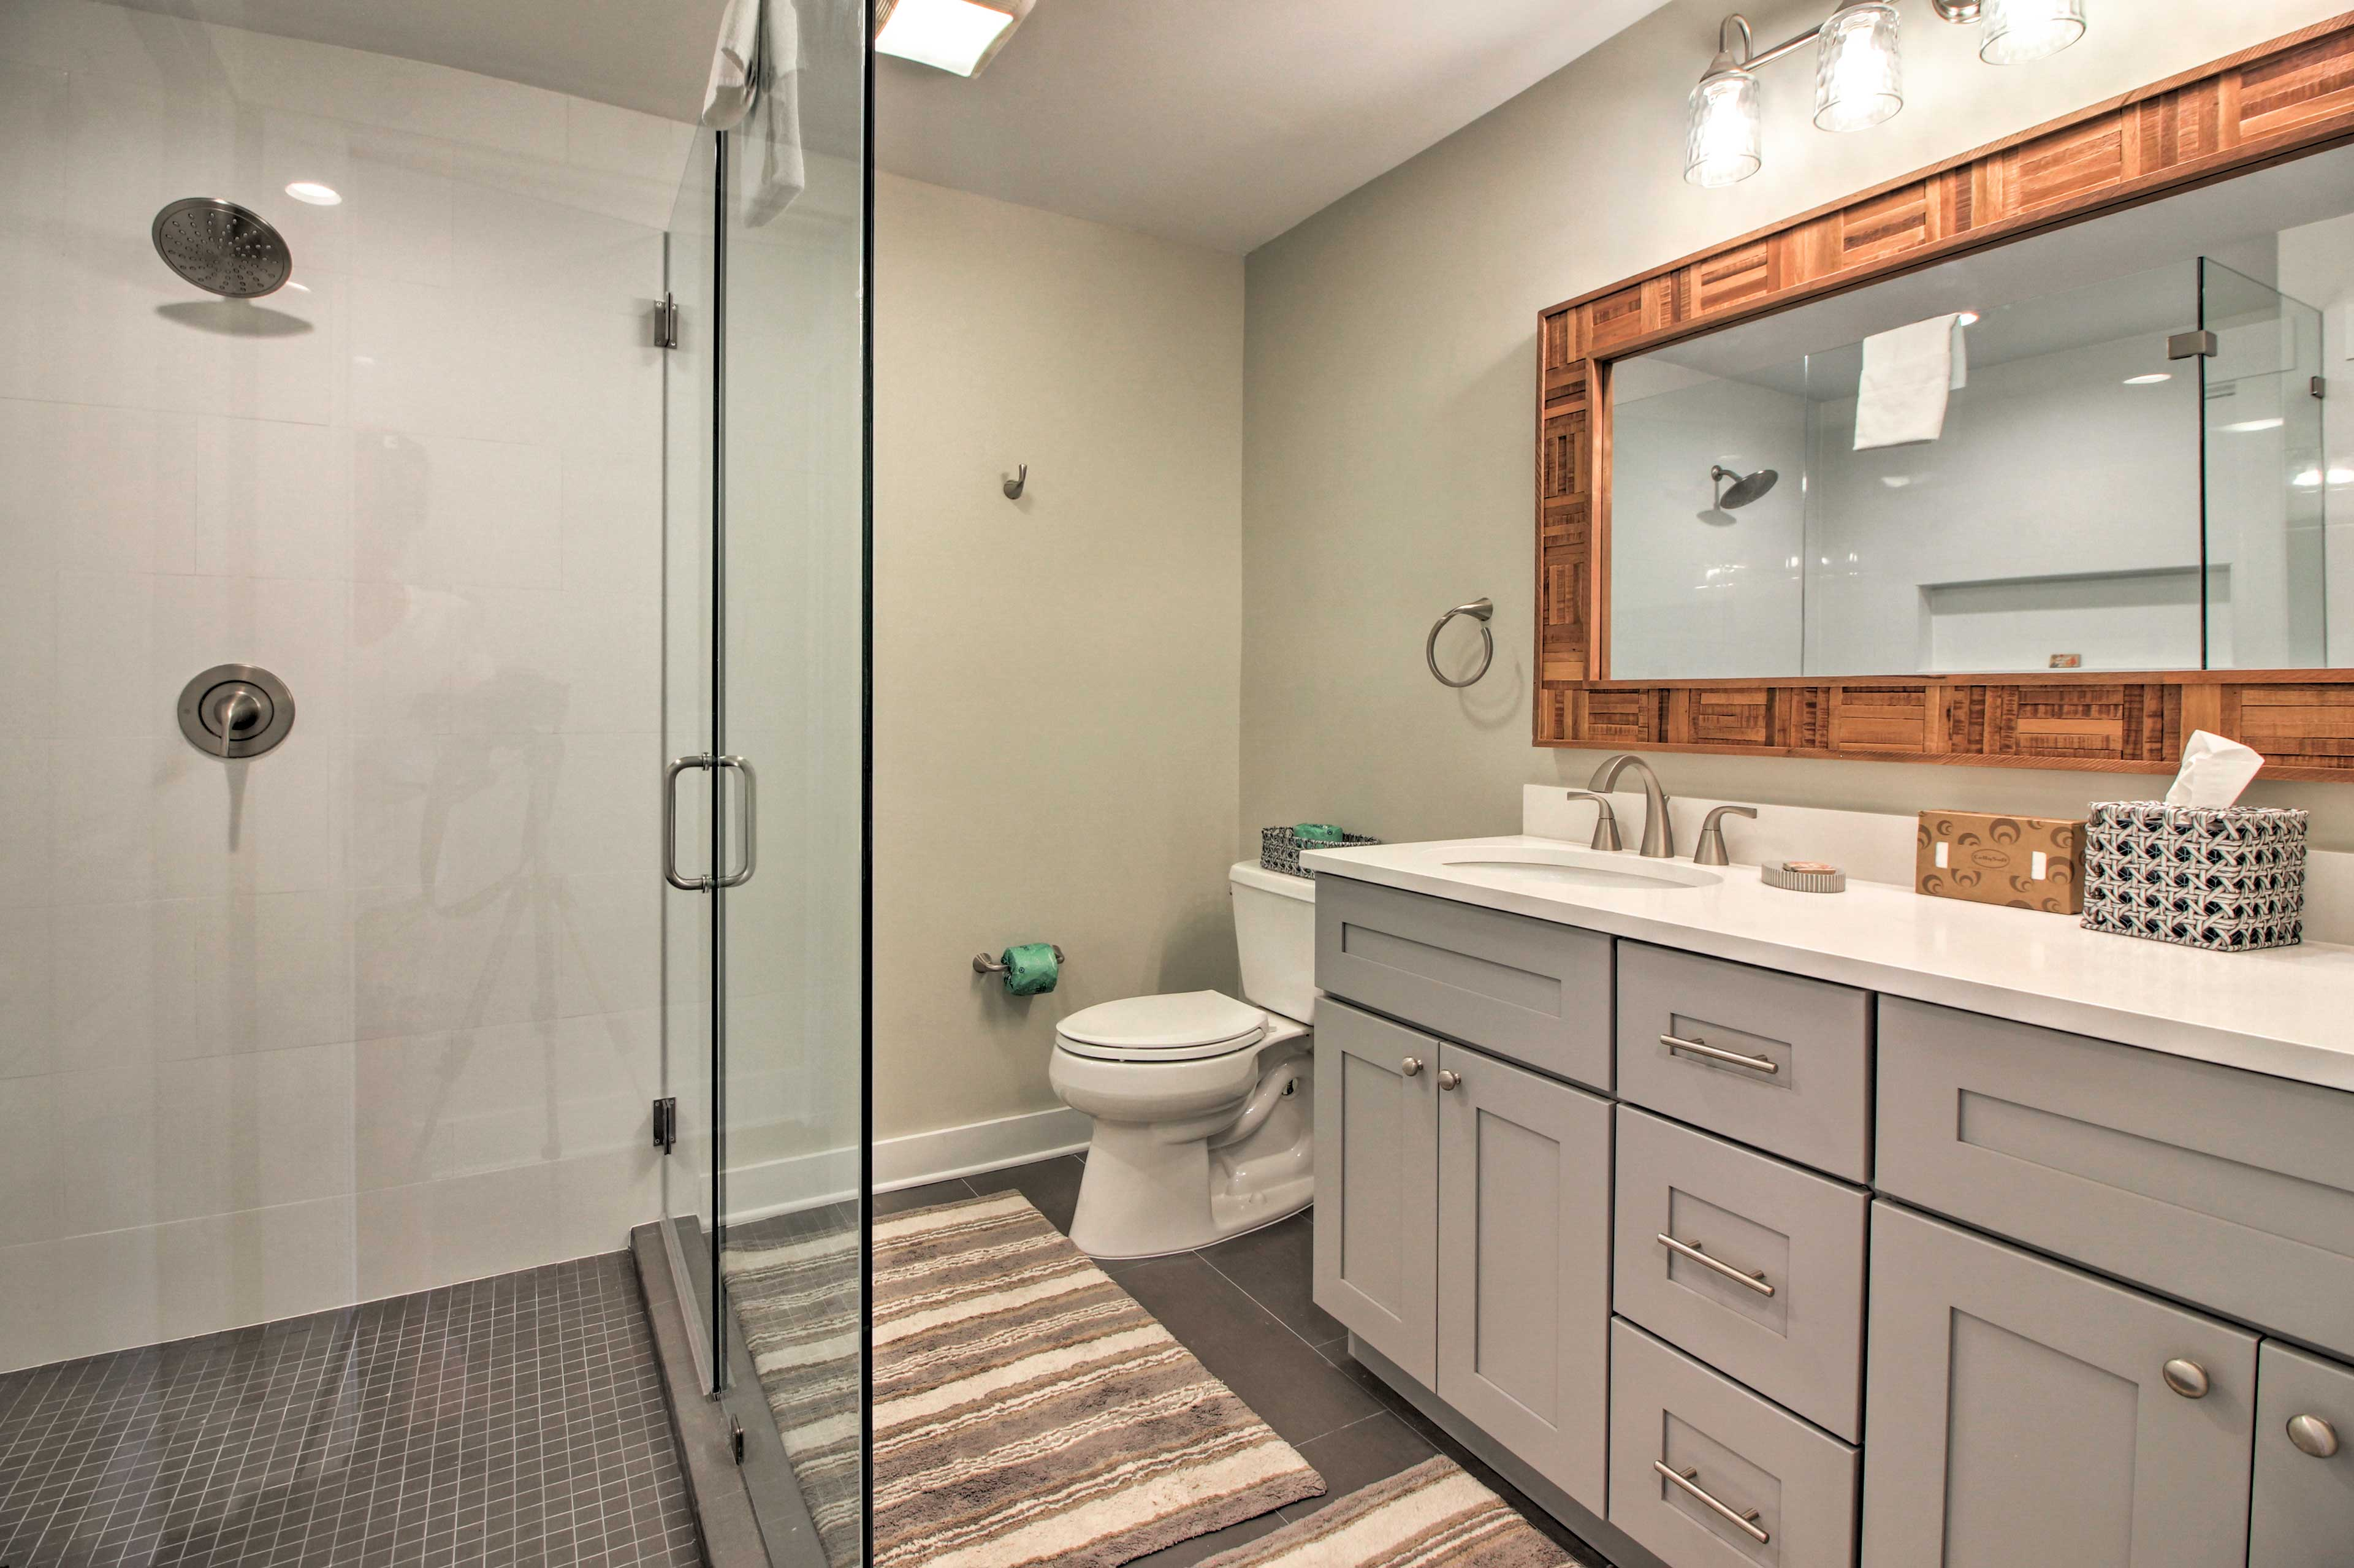 The bathroom includes a rain tree shower head and double sinks.